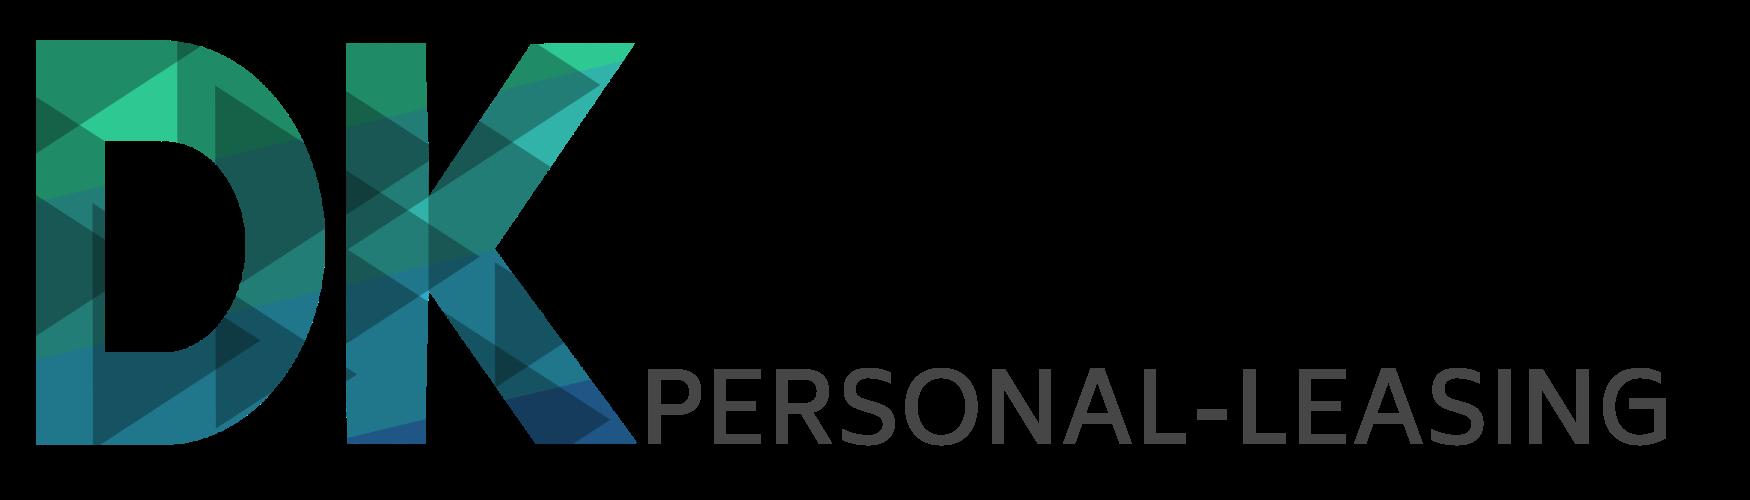 DK-PERSONALLEASING Logo